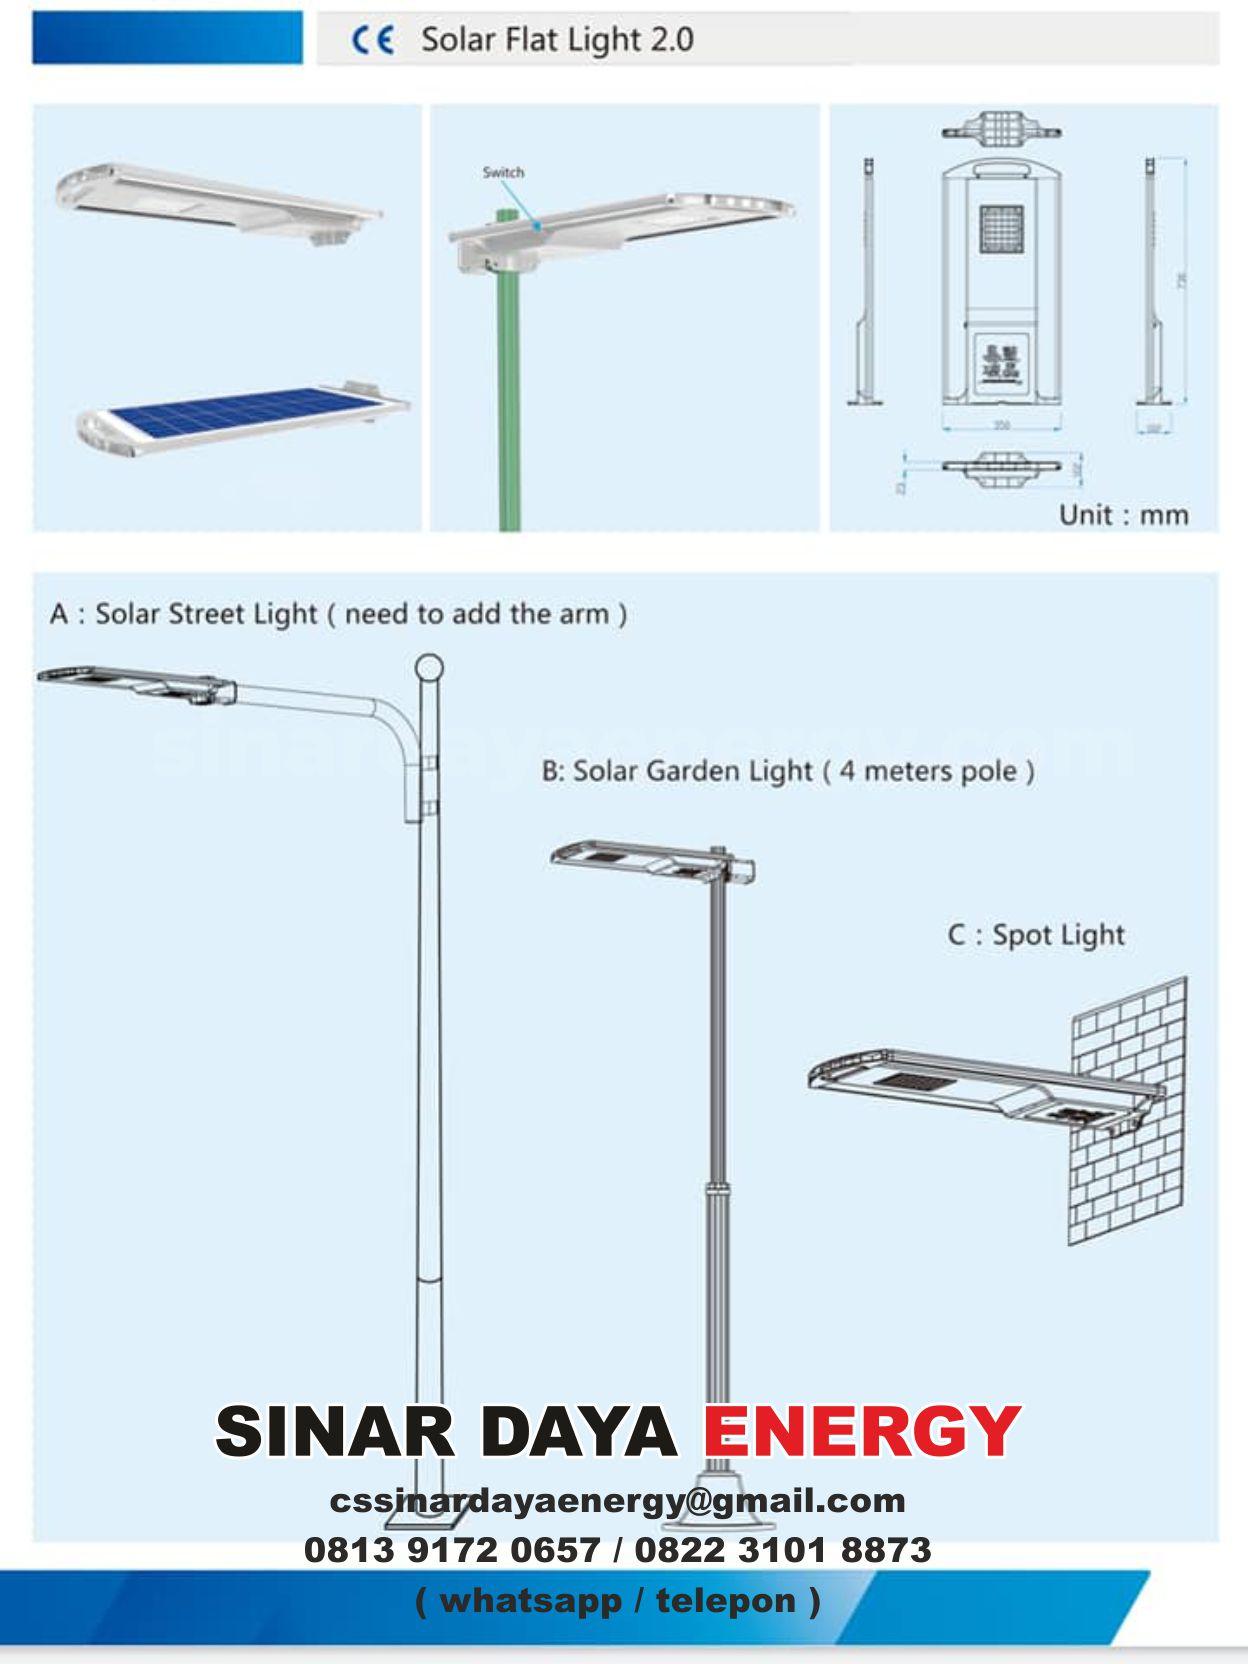 beli Solar Flat Light 20W